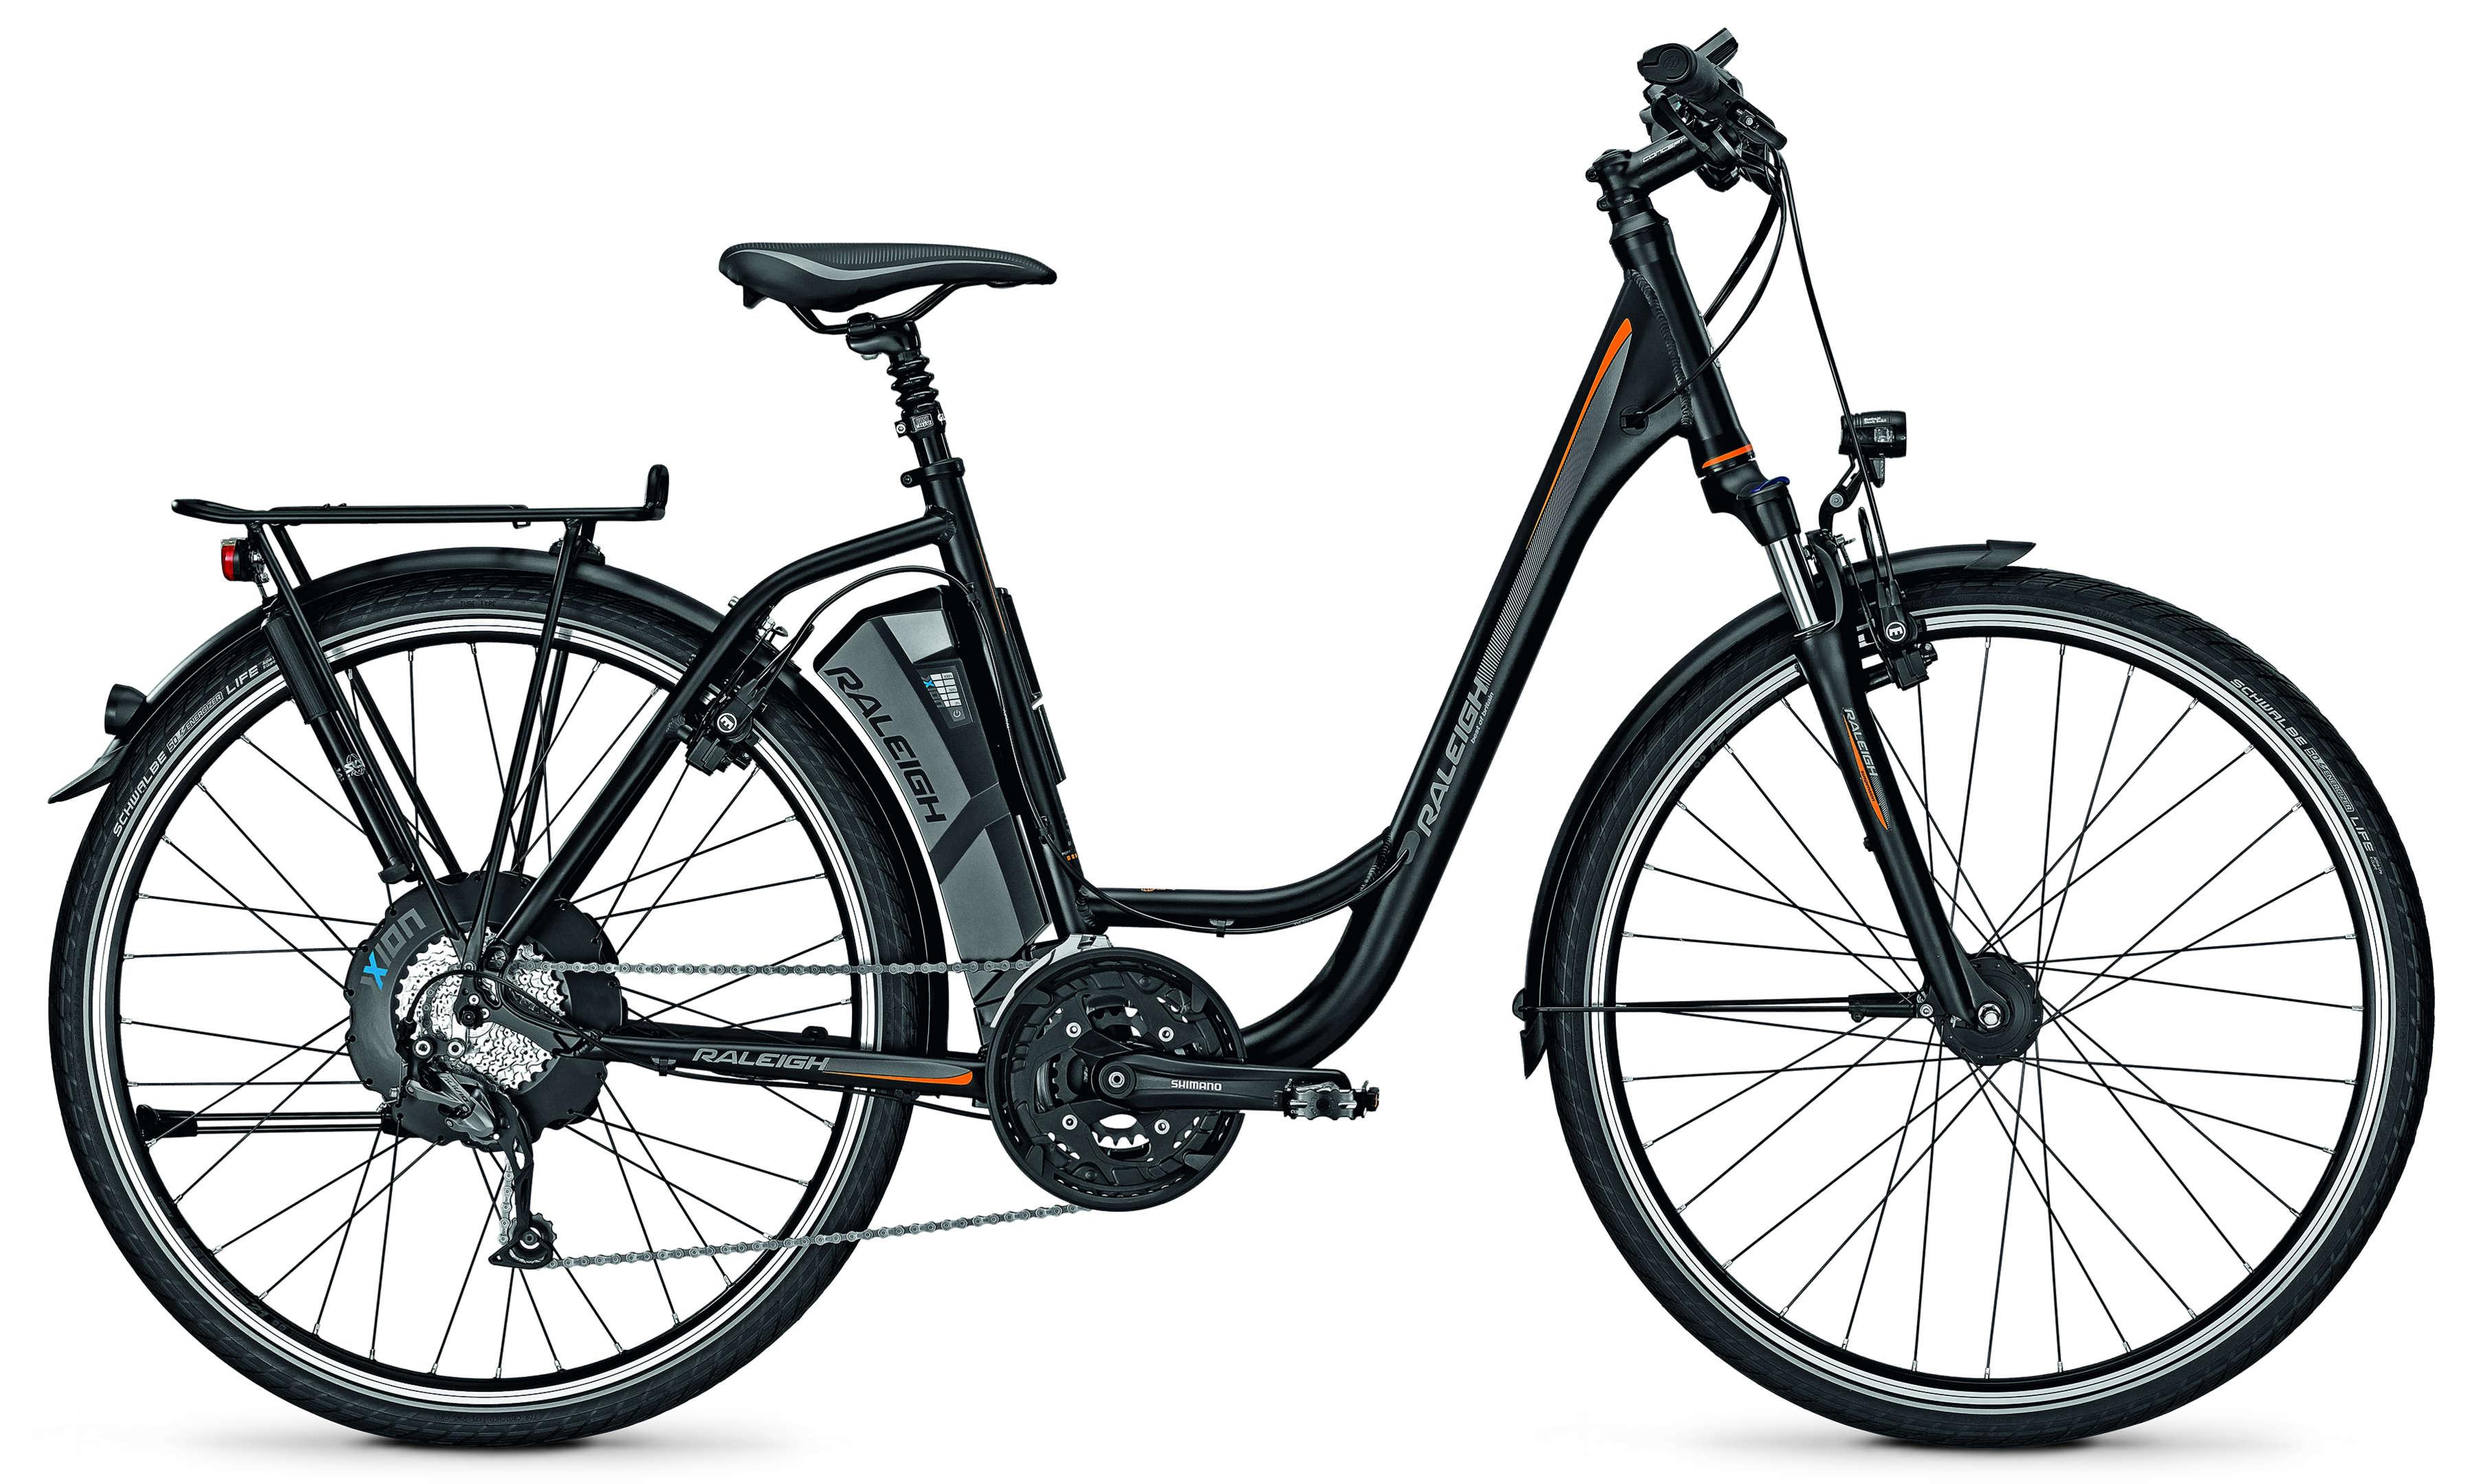 raleigh e bike stoker x3 eurorad bikeleasingeurorad bikeleasing. Black Bedroom Furniture Sets. Home Design Ideas